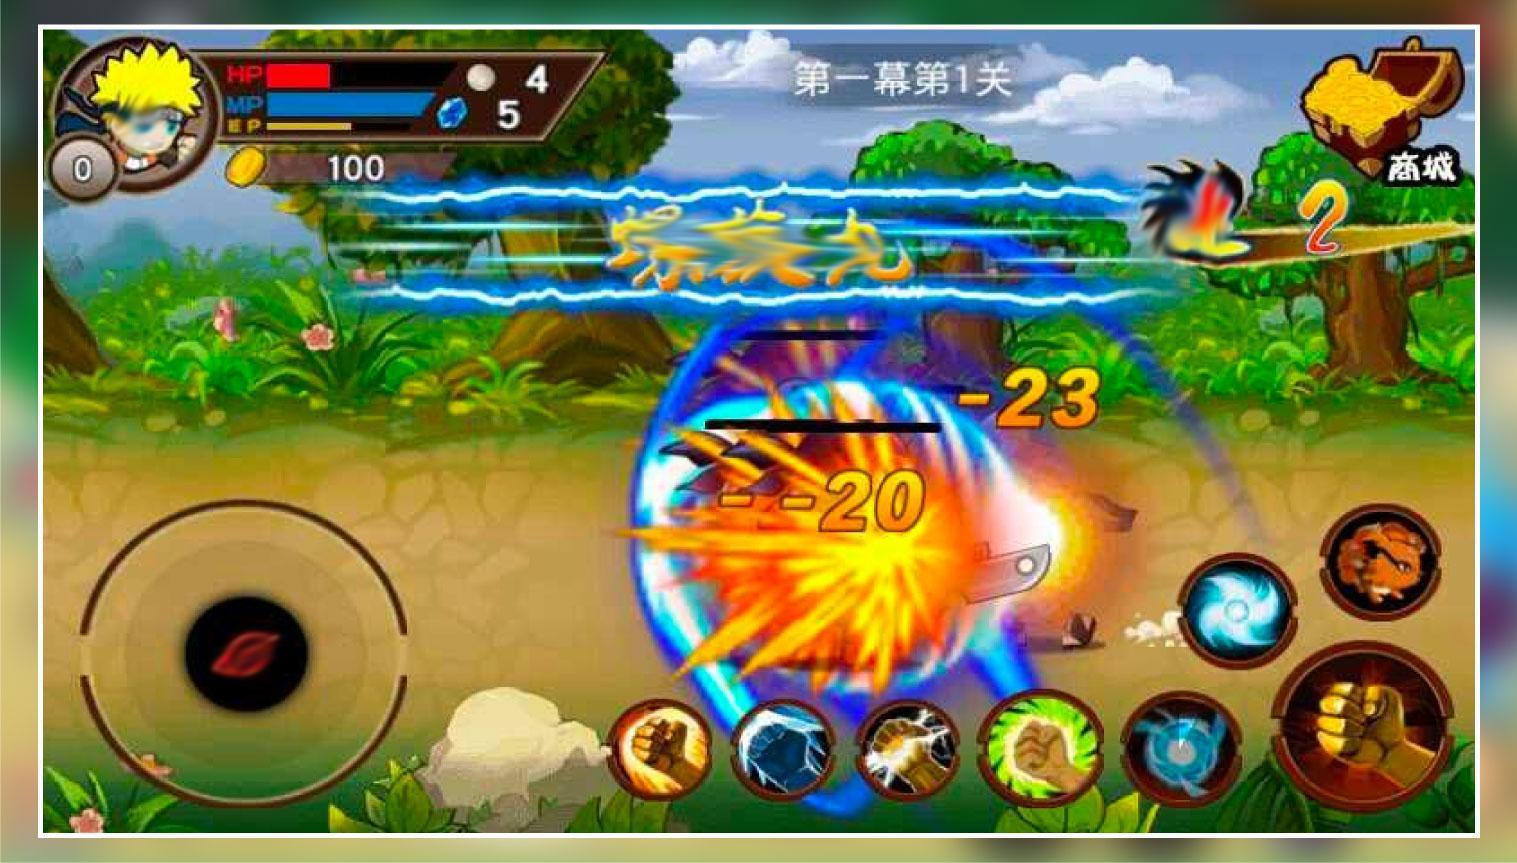 Naruto Shippuden Ultimate Ninja Storm 4 Senki Hint for